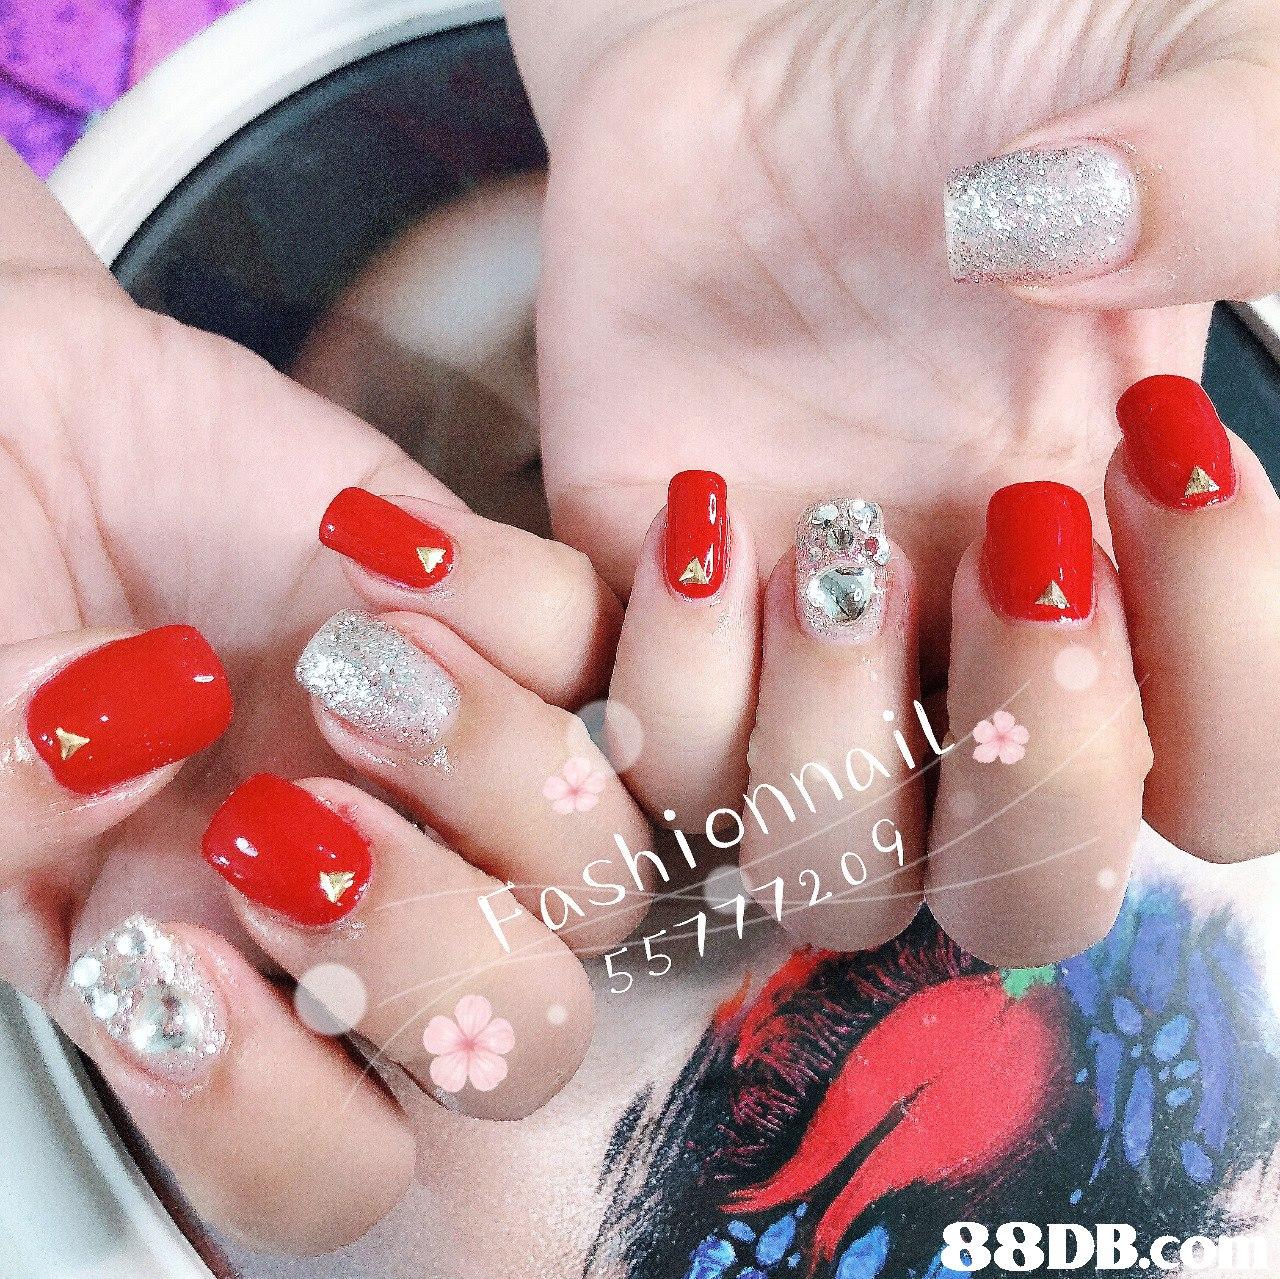 ashionna  Nail polish,Nail,Manicure,Nail care,Finger